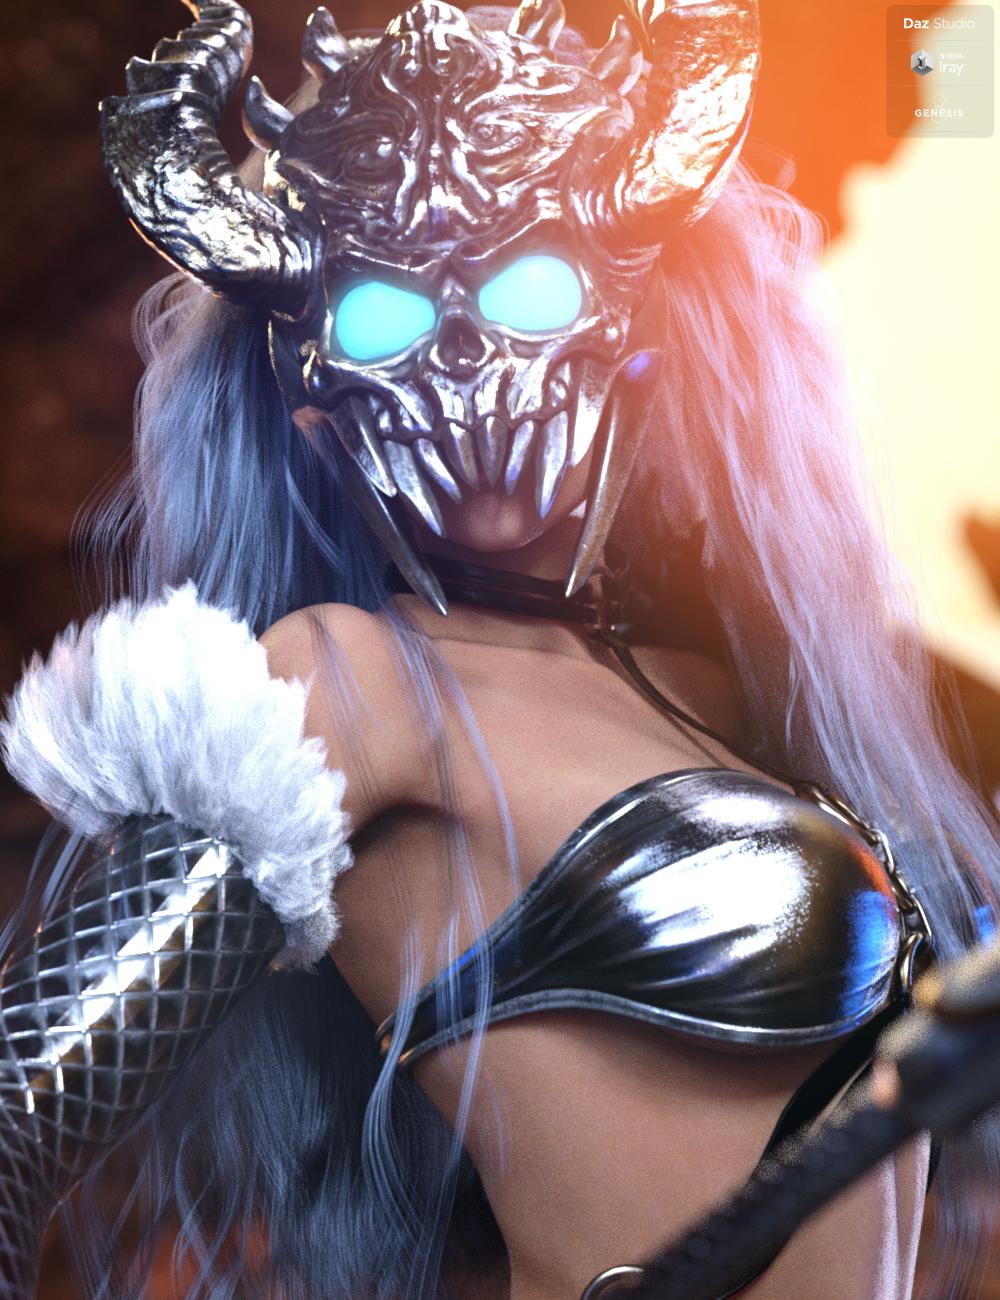 Hel The Goddess of Underworld Bundle by: HM, 3D Models by Daz 3D